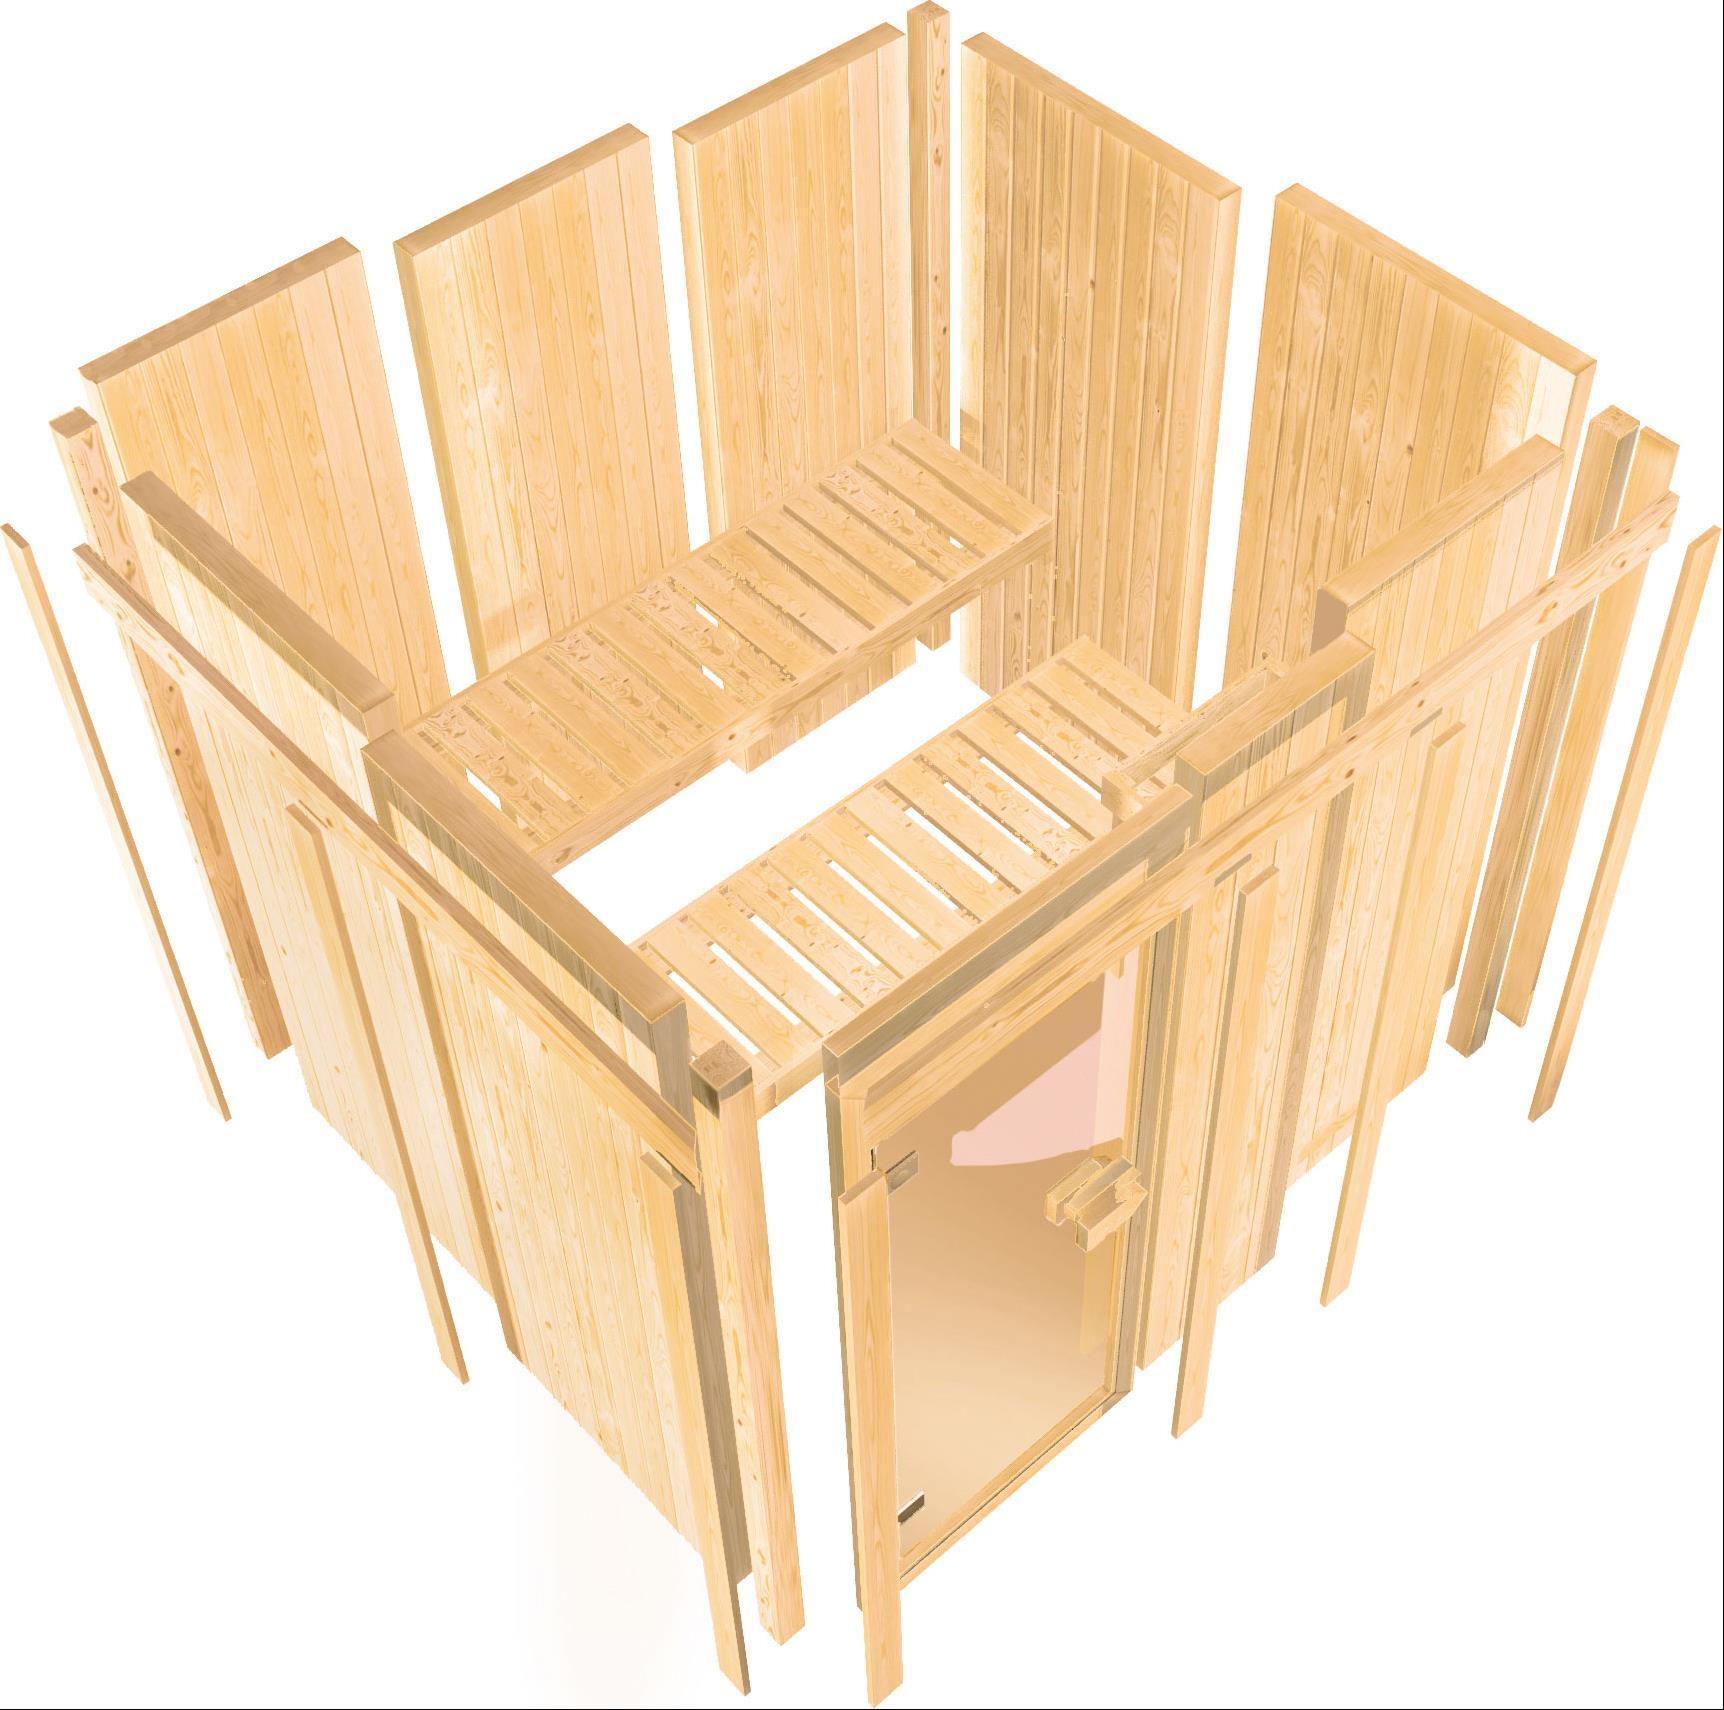 Karibu Sauna Sitania 68mm Saunaofen 9kW extern Tür Holz Aktion Bild 4